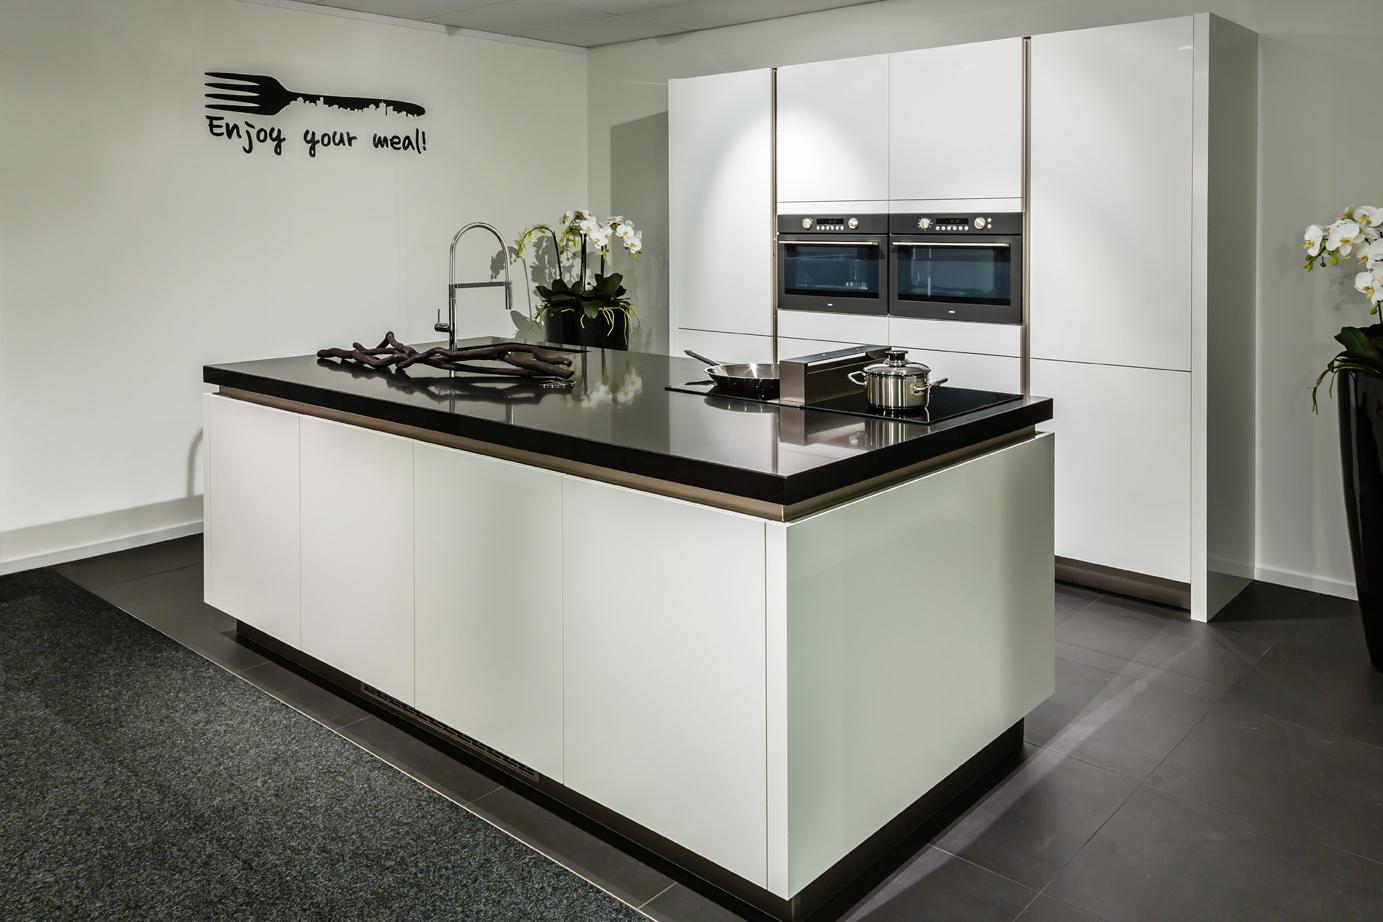 Moderne Keuken Met Schiereiland : Moderne Keuken Met Schiereiland : Moderne keuken